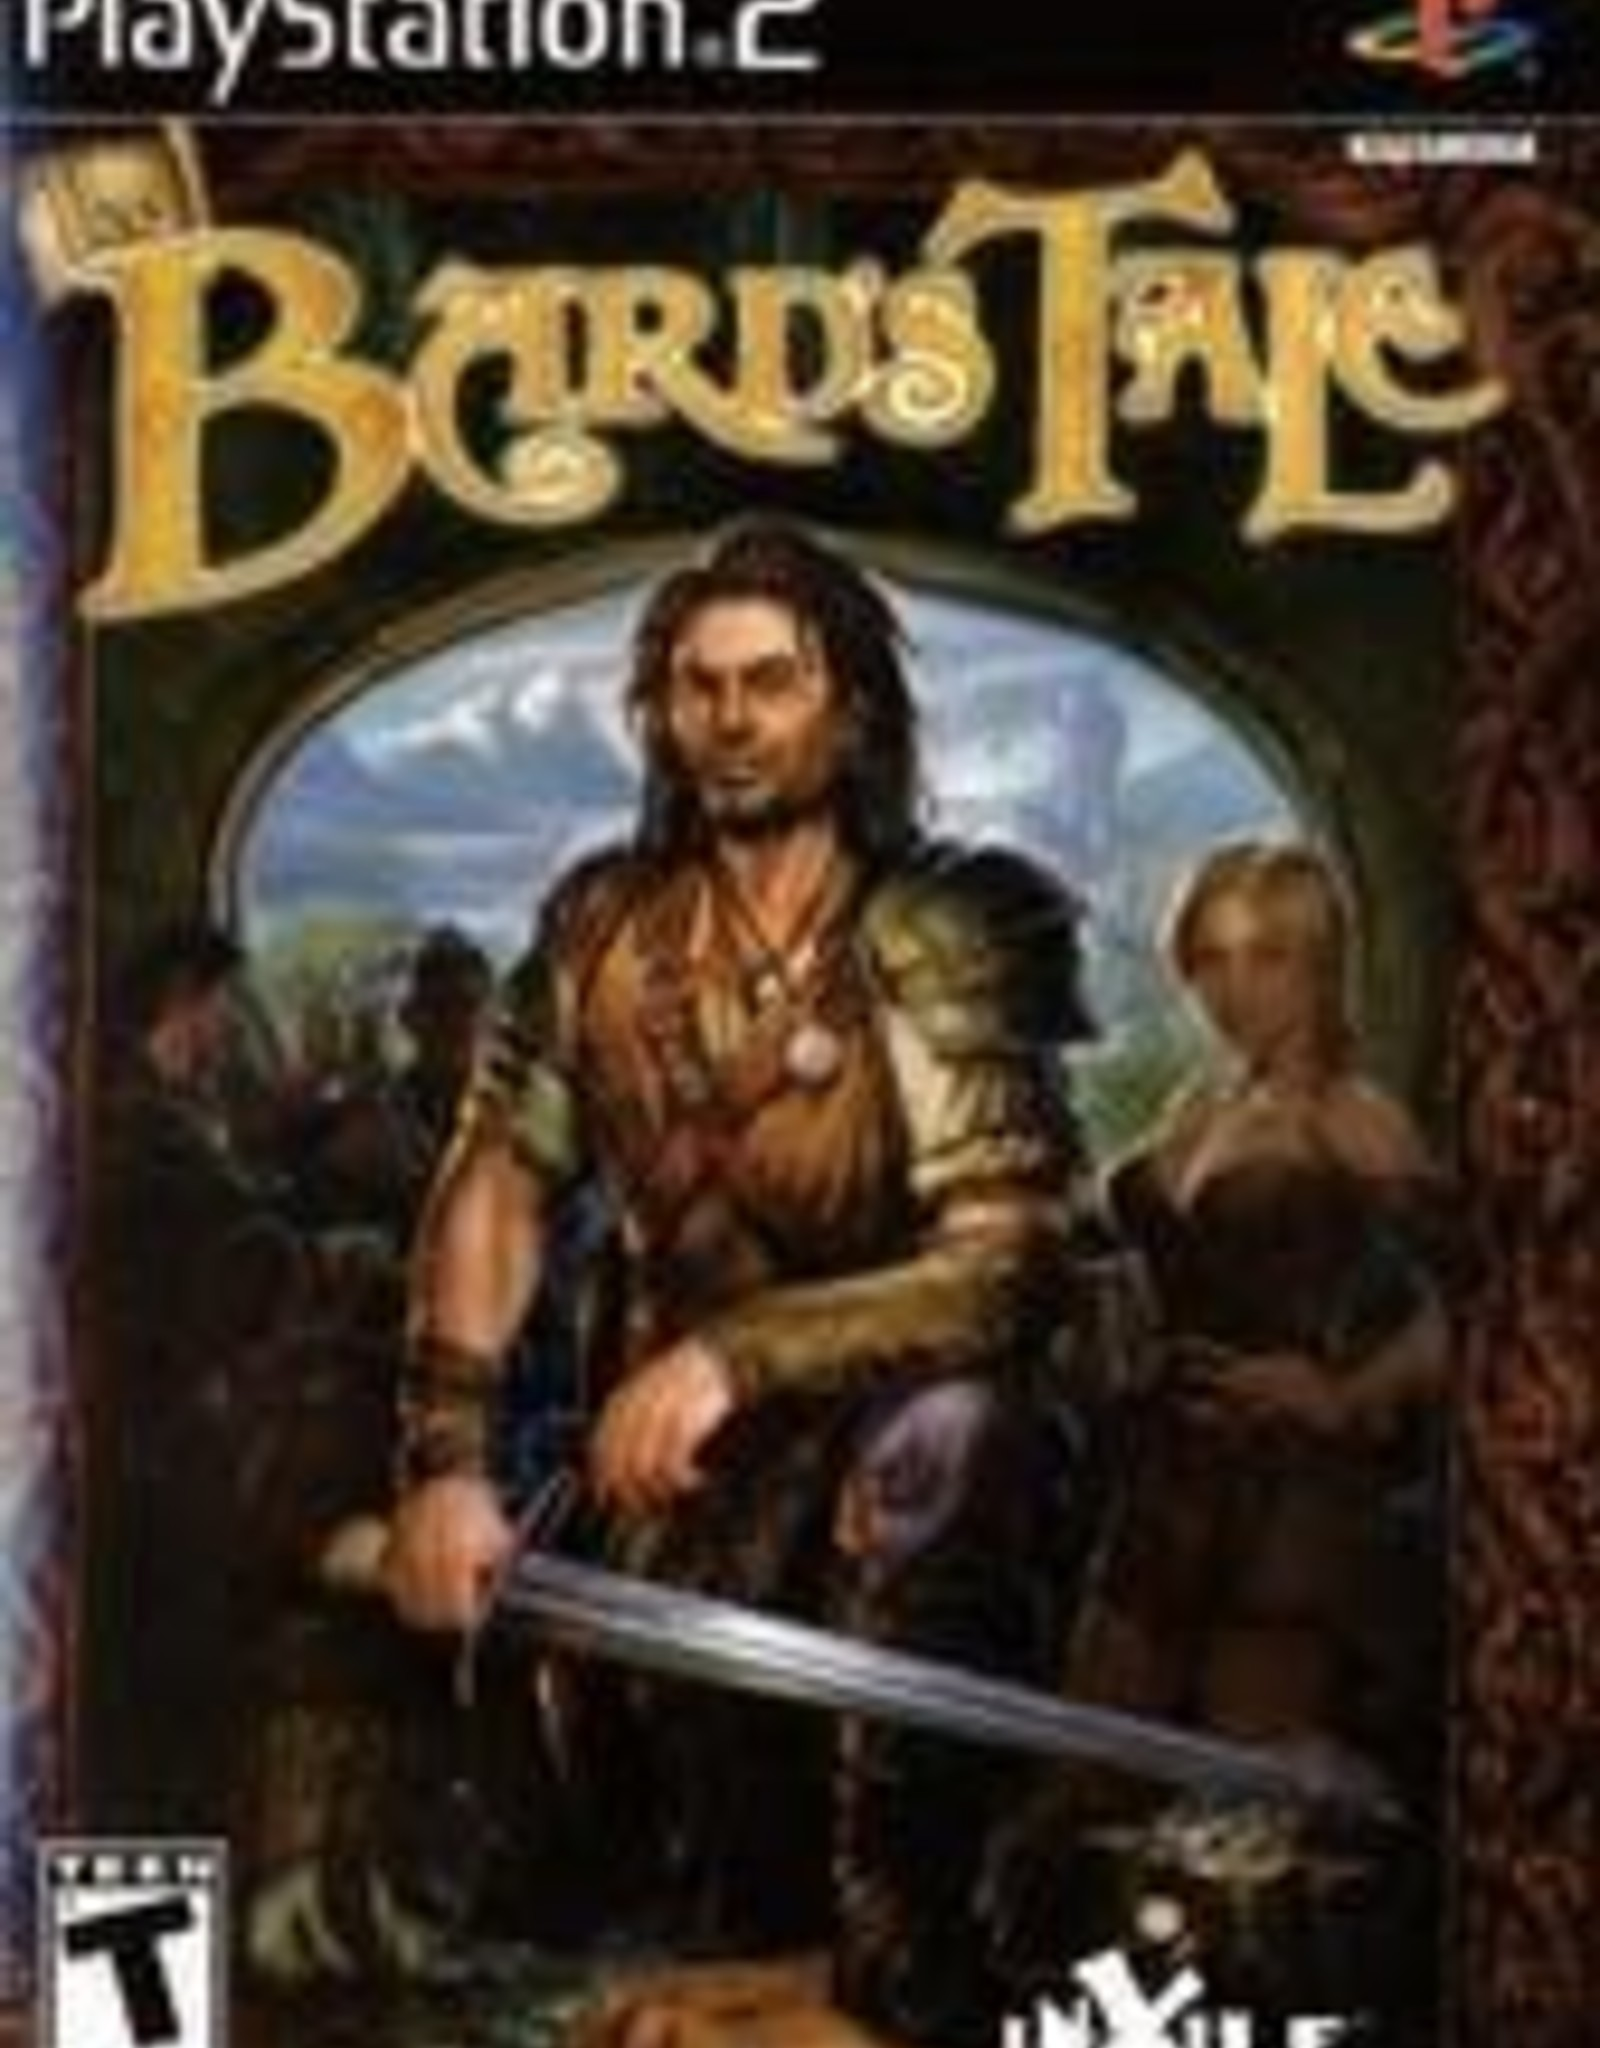 Playstation 2 Bard's Tale